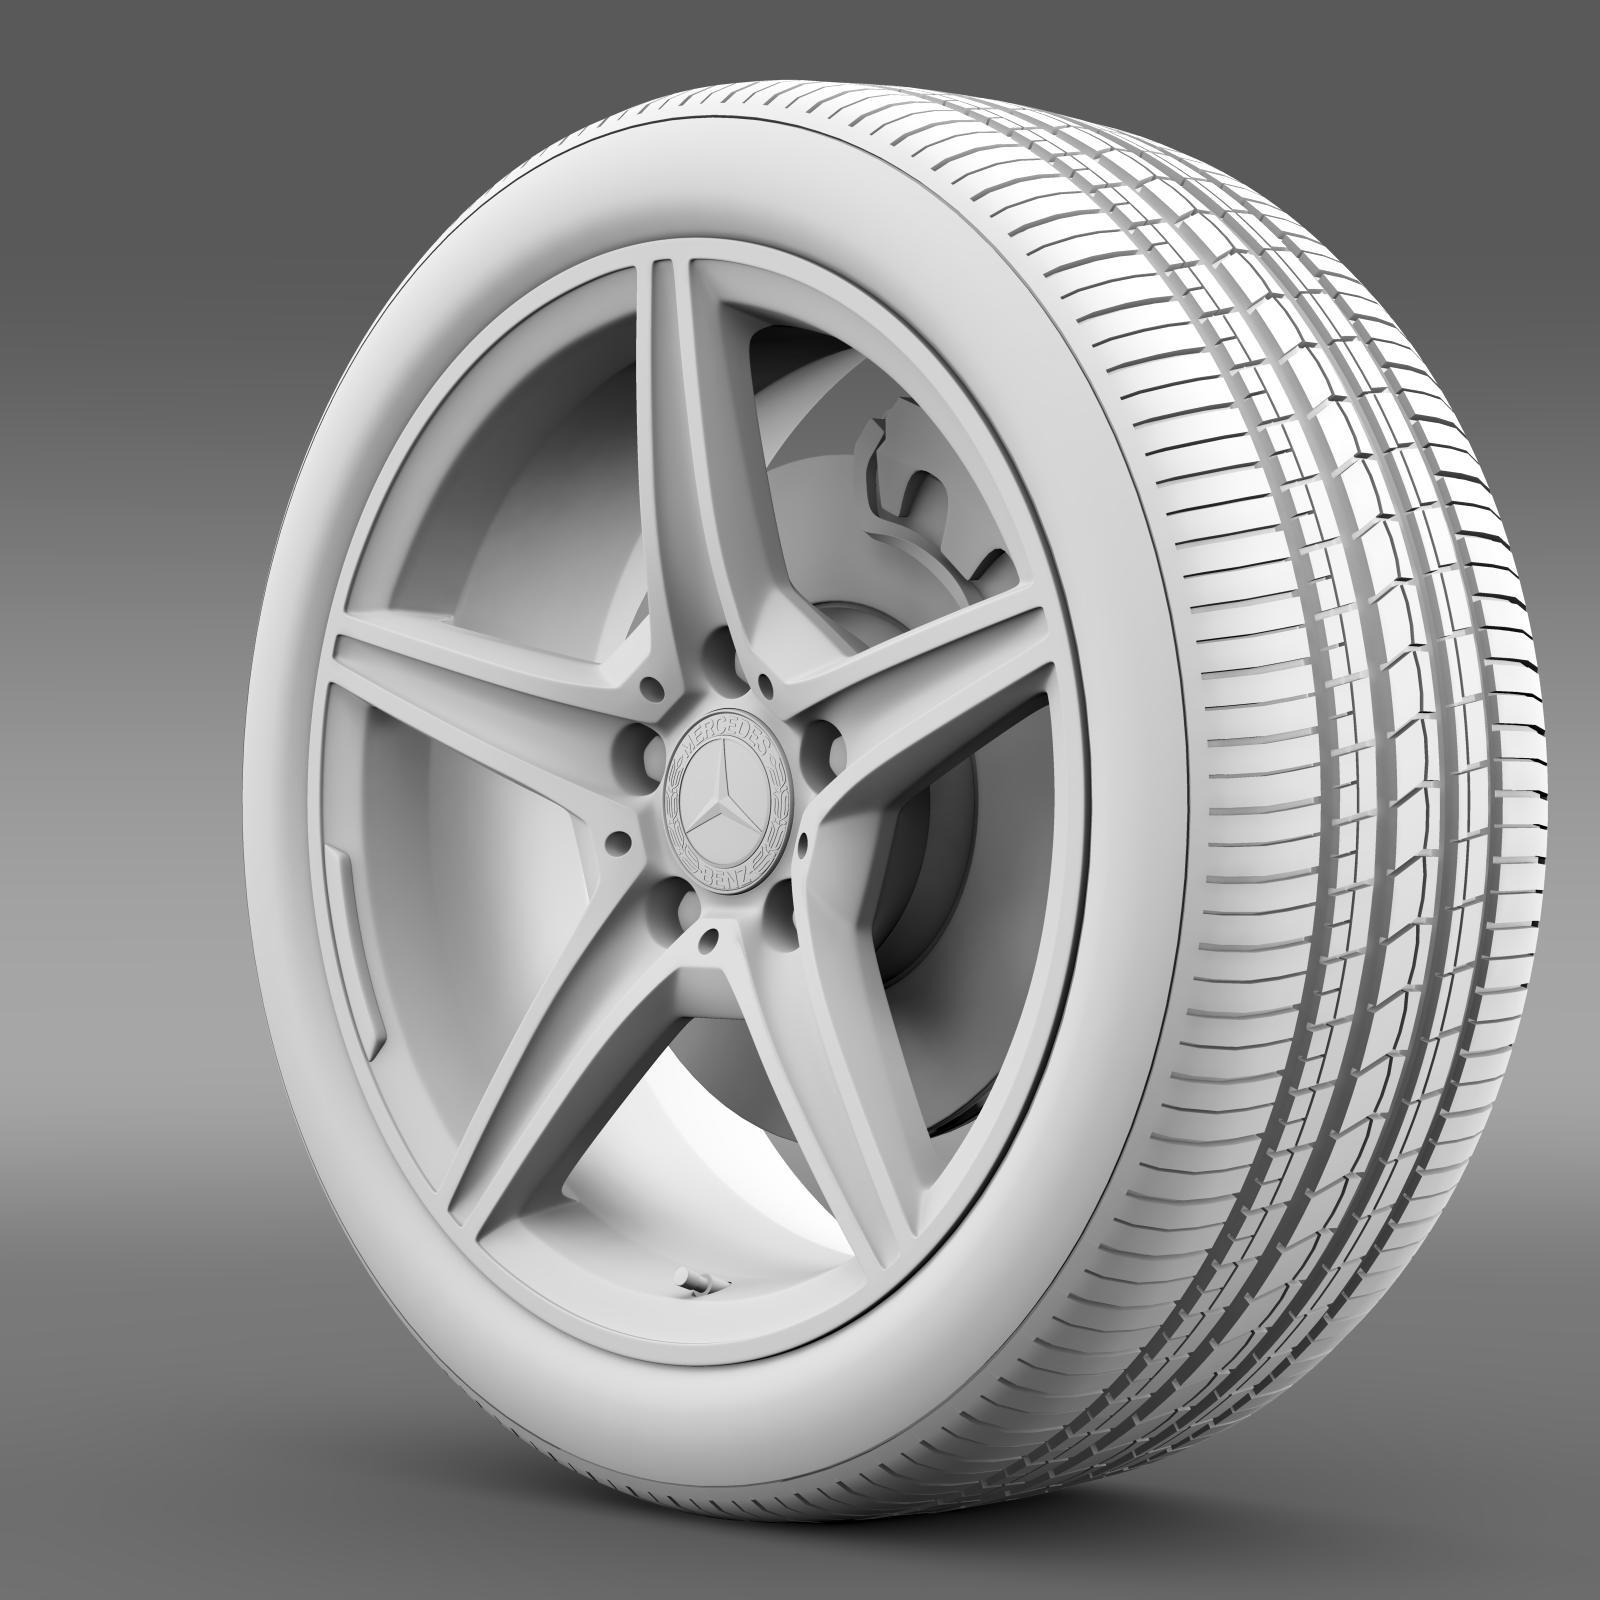 mercedes benz c 400 4matic amg line wheel 3d model 3ds max fbx c4d lwo ma mb hrc xsi obj 210790